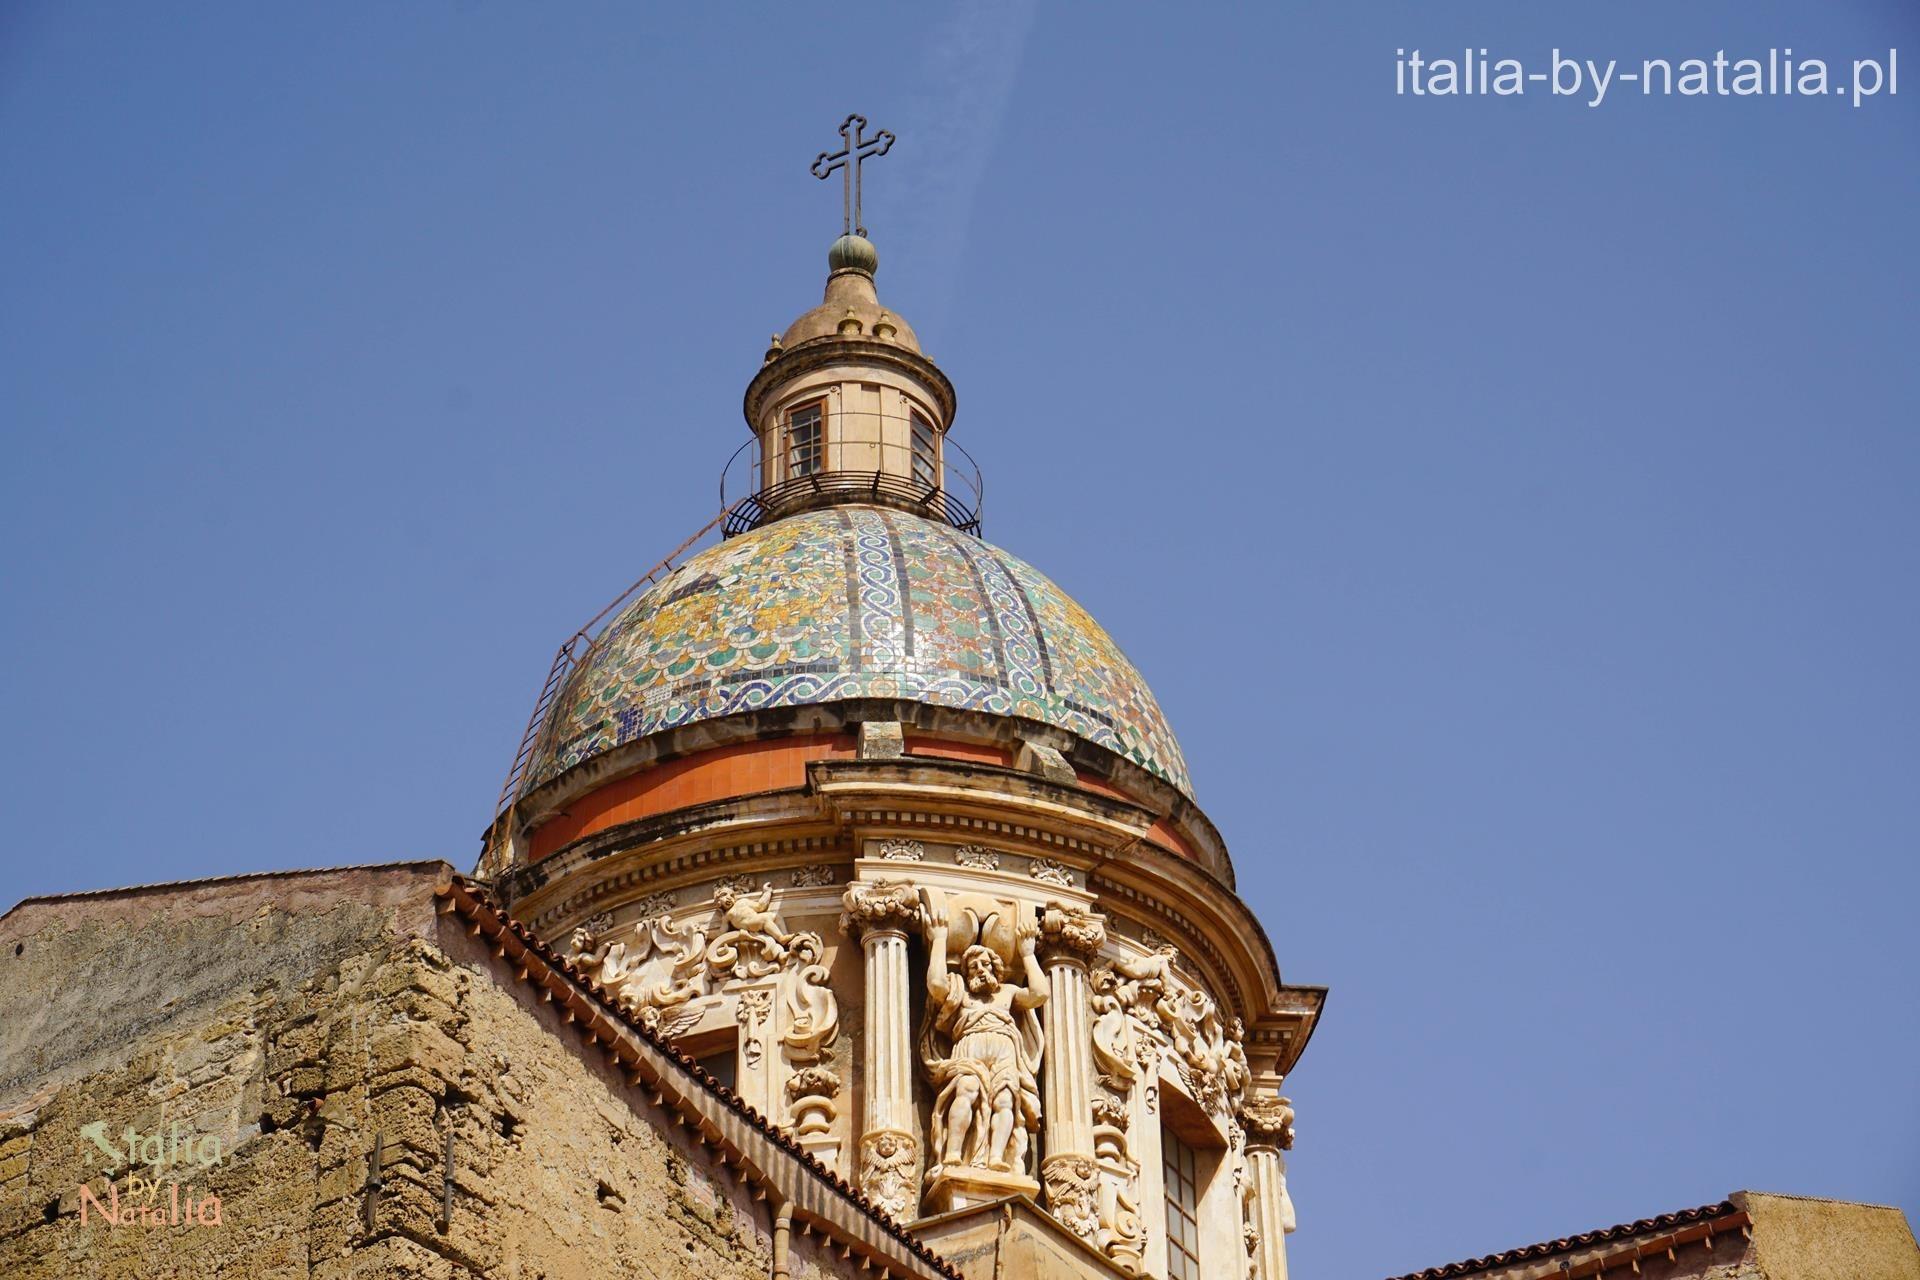 Palermo kopuła kościoła Carmine Maggiore